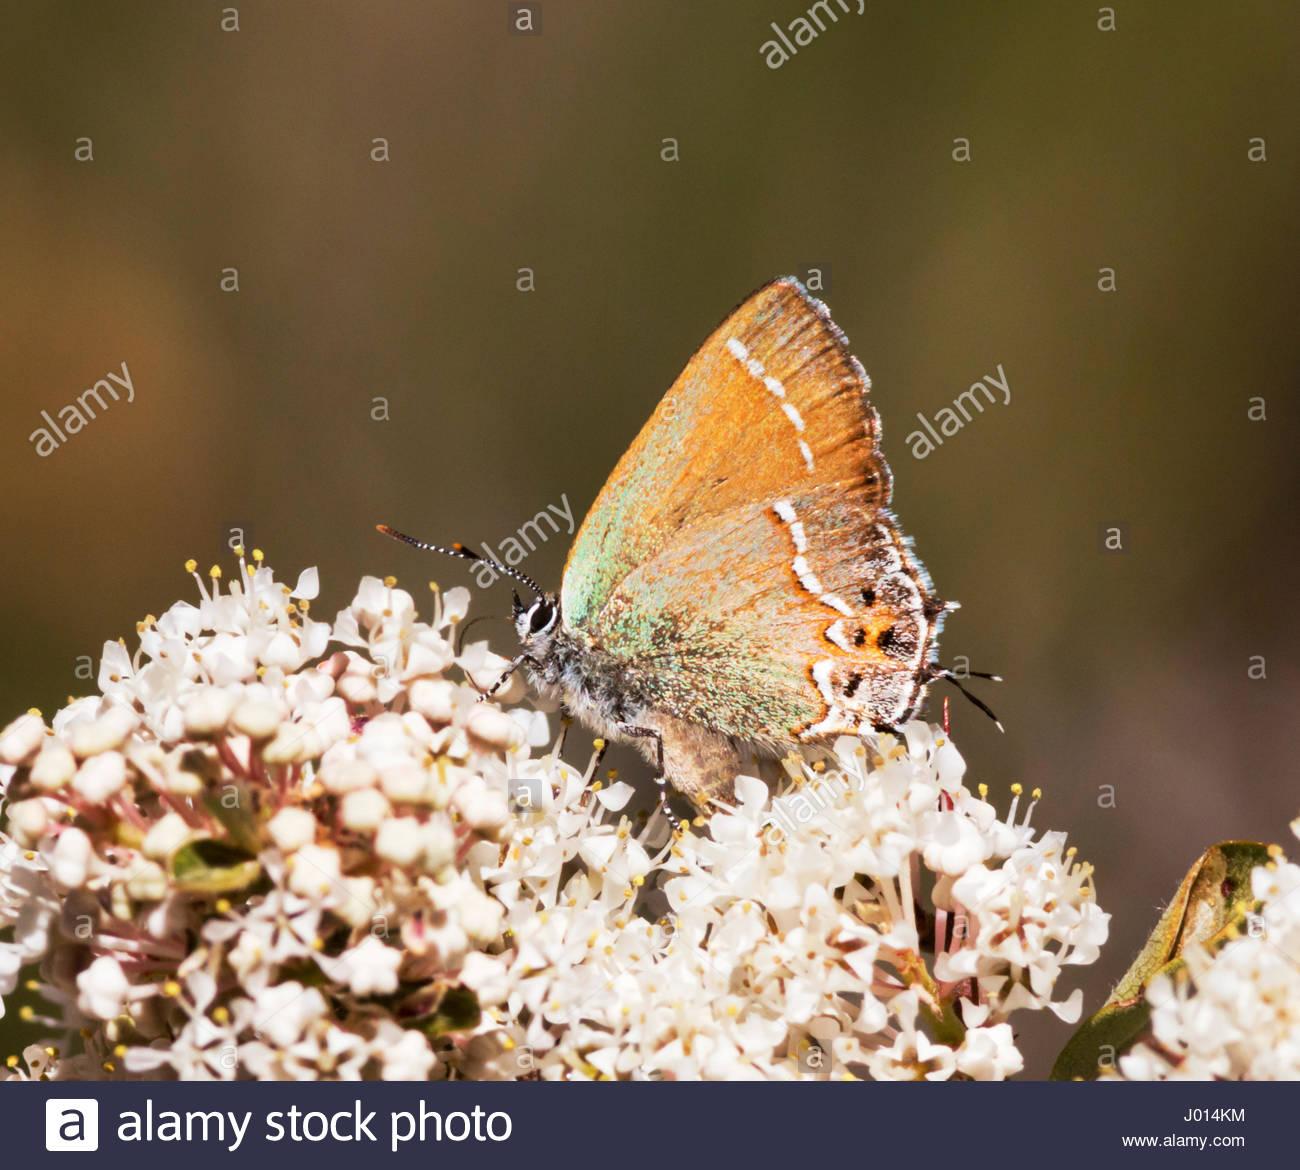 Siva Juniper Hairstreak, Callophrys gryneus siva, Mitoura gryneus siva, Mariposa , de flores blancas en Arizona Foto de stock